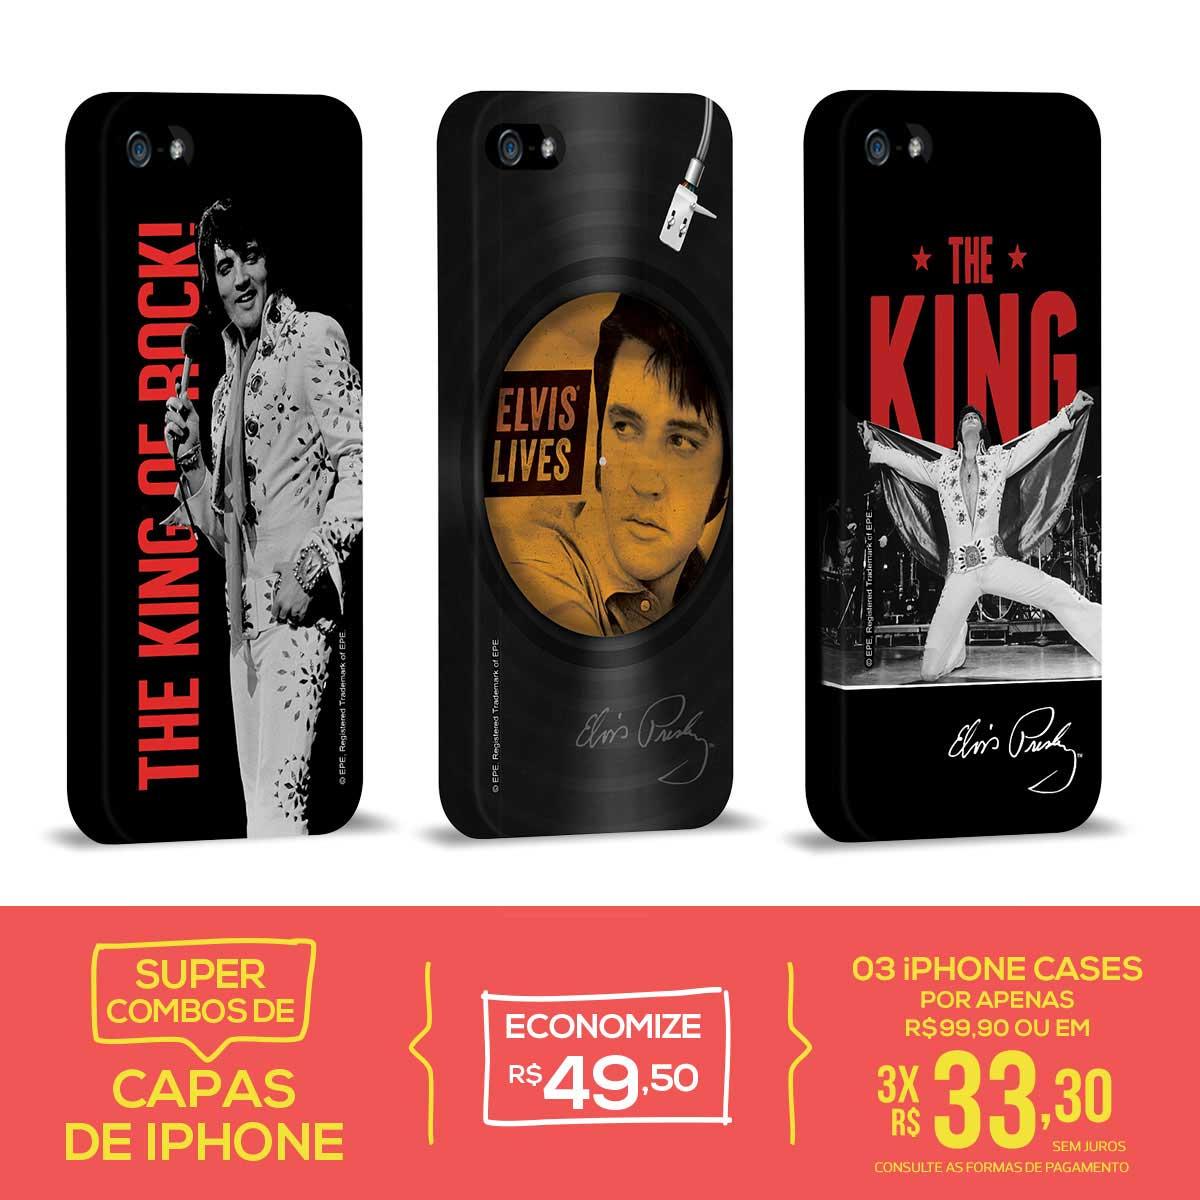 Kit Com 3 Capas de iPhone 5/5S Elvis Presley The King